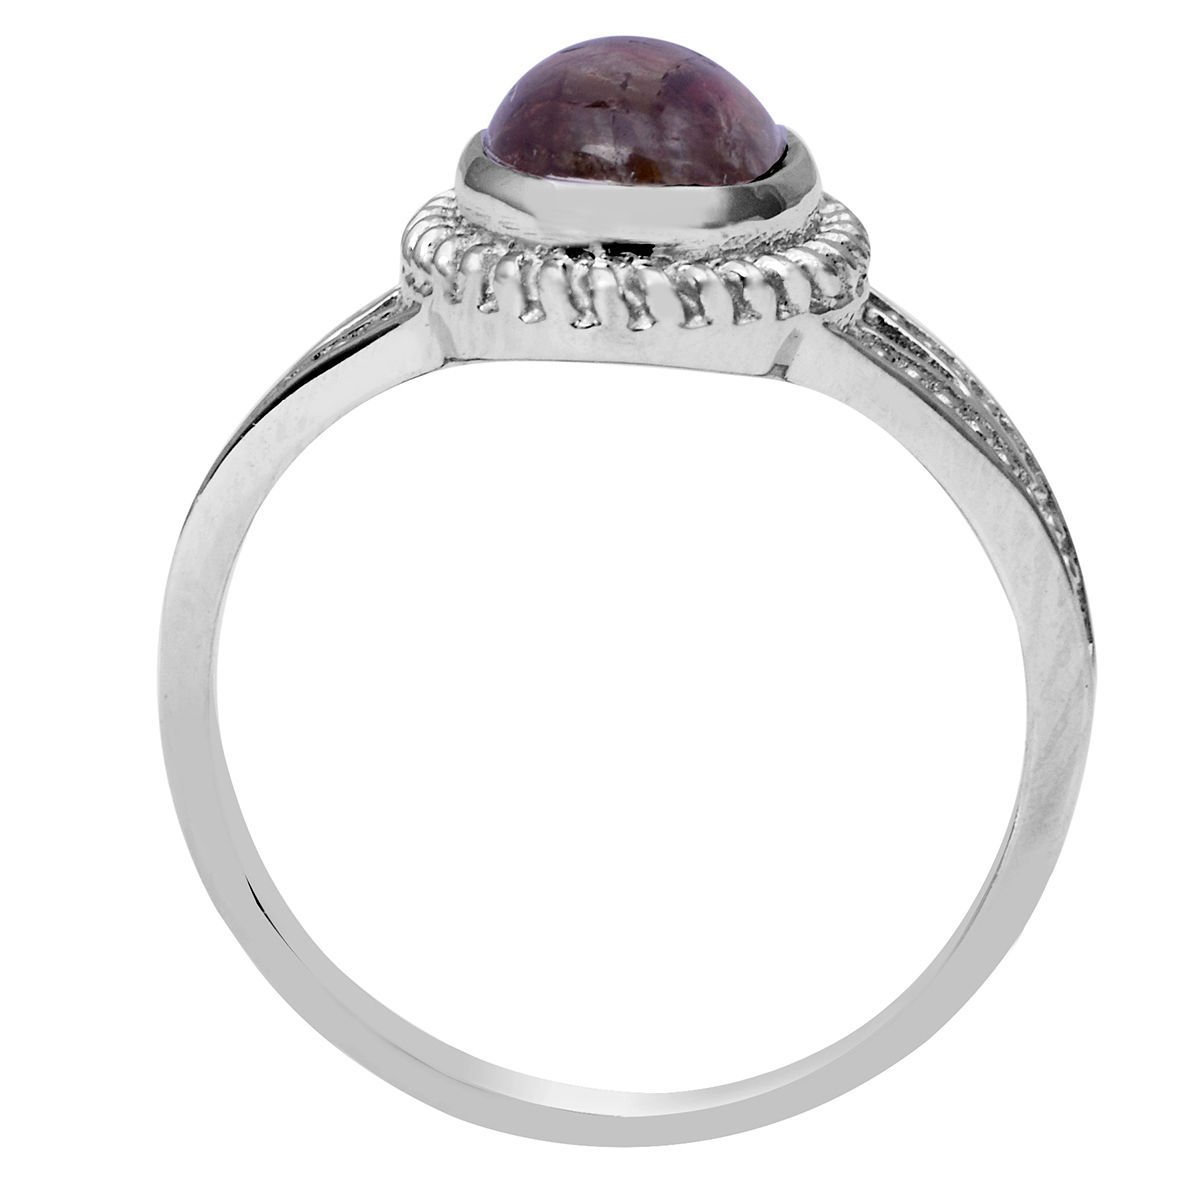 Handmade Tourmaline Gemstone 925 Sterling Silver Jewelry Ring Sz 6.5 SHRI0719